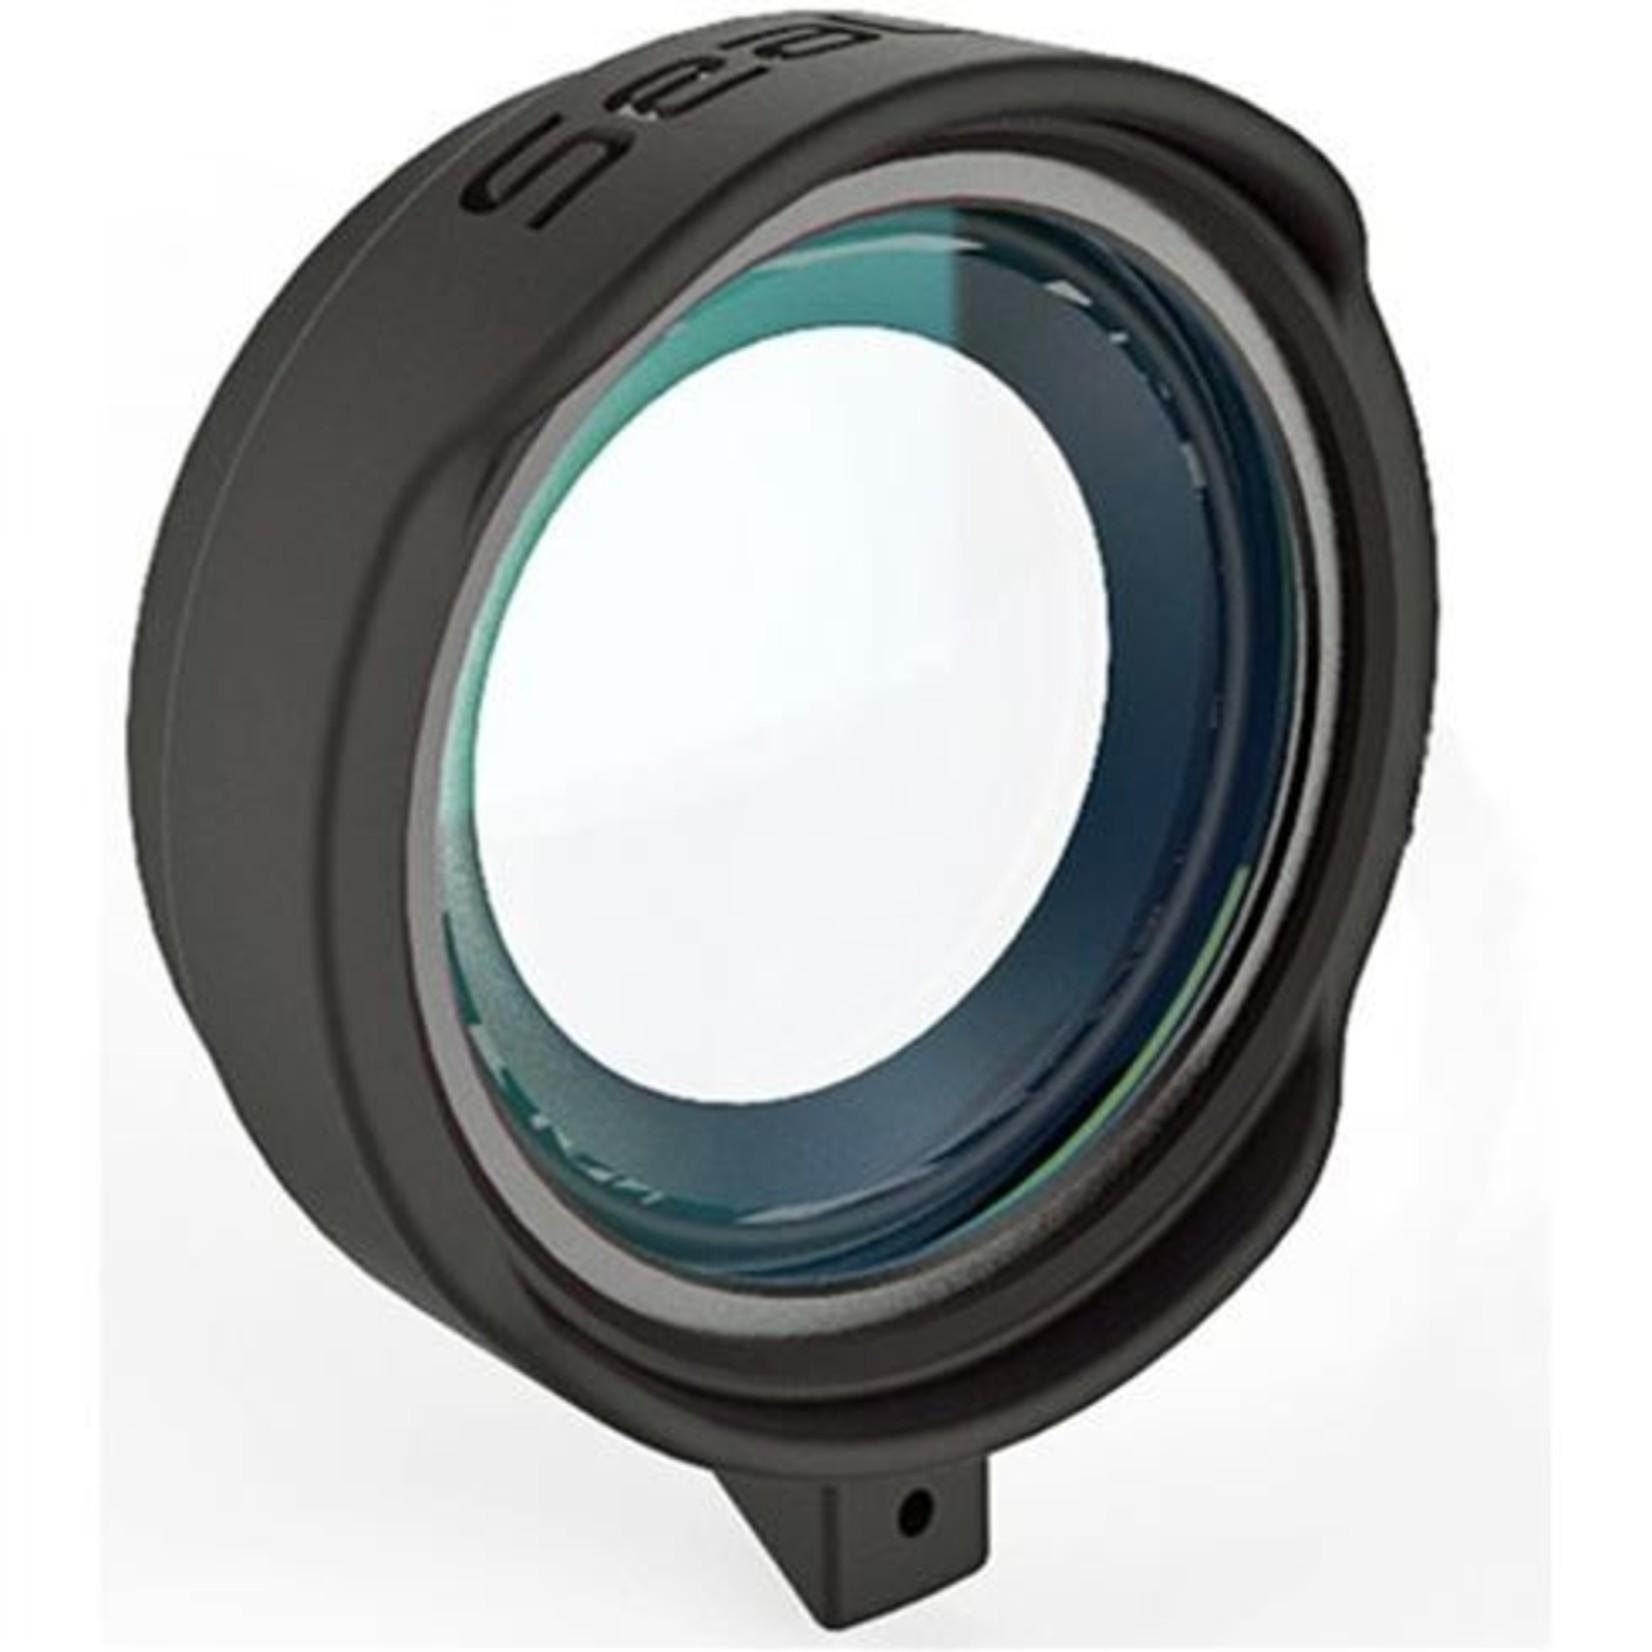 Sealife Super Macro Close-Up Lens (for RM-4K & Micro HD/HD+/2.0)